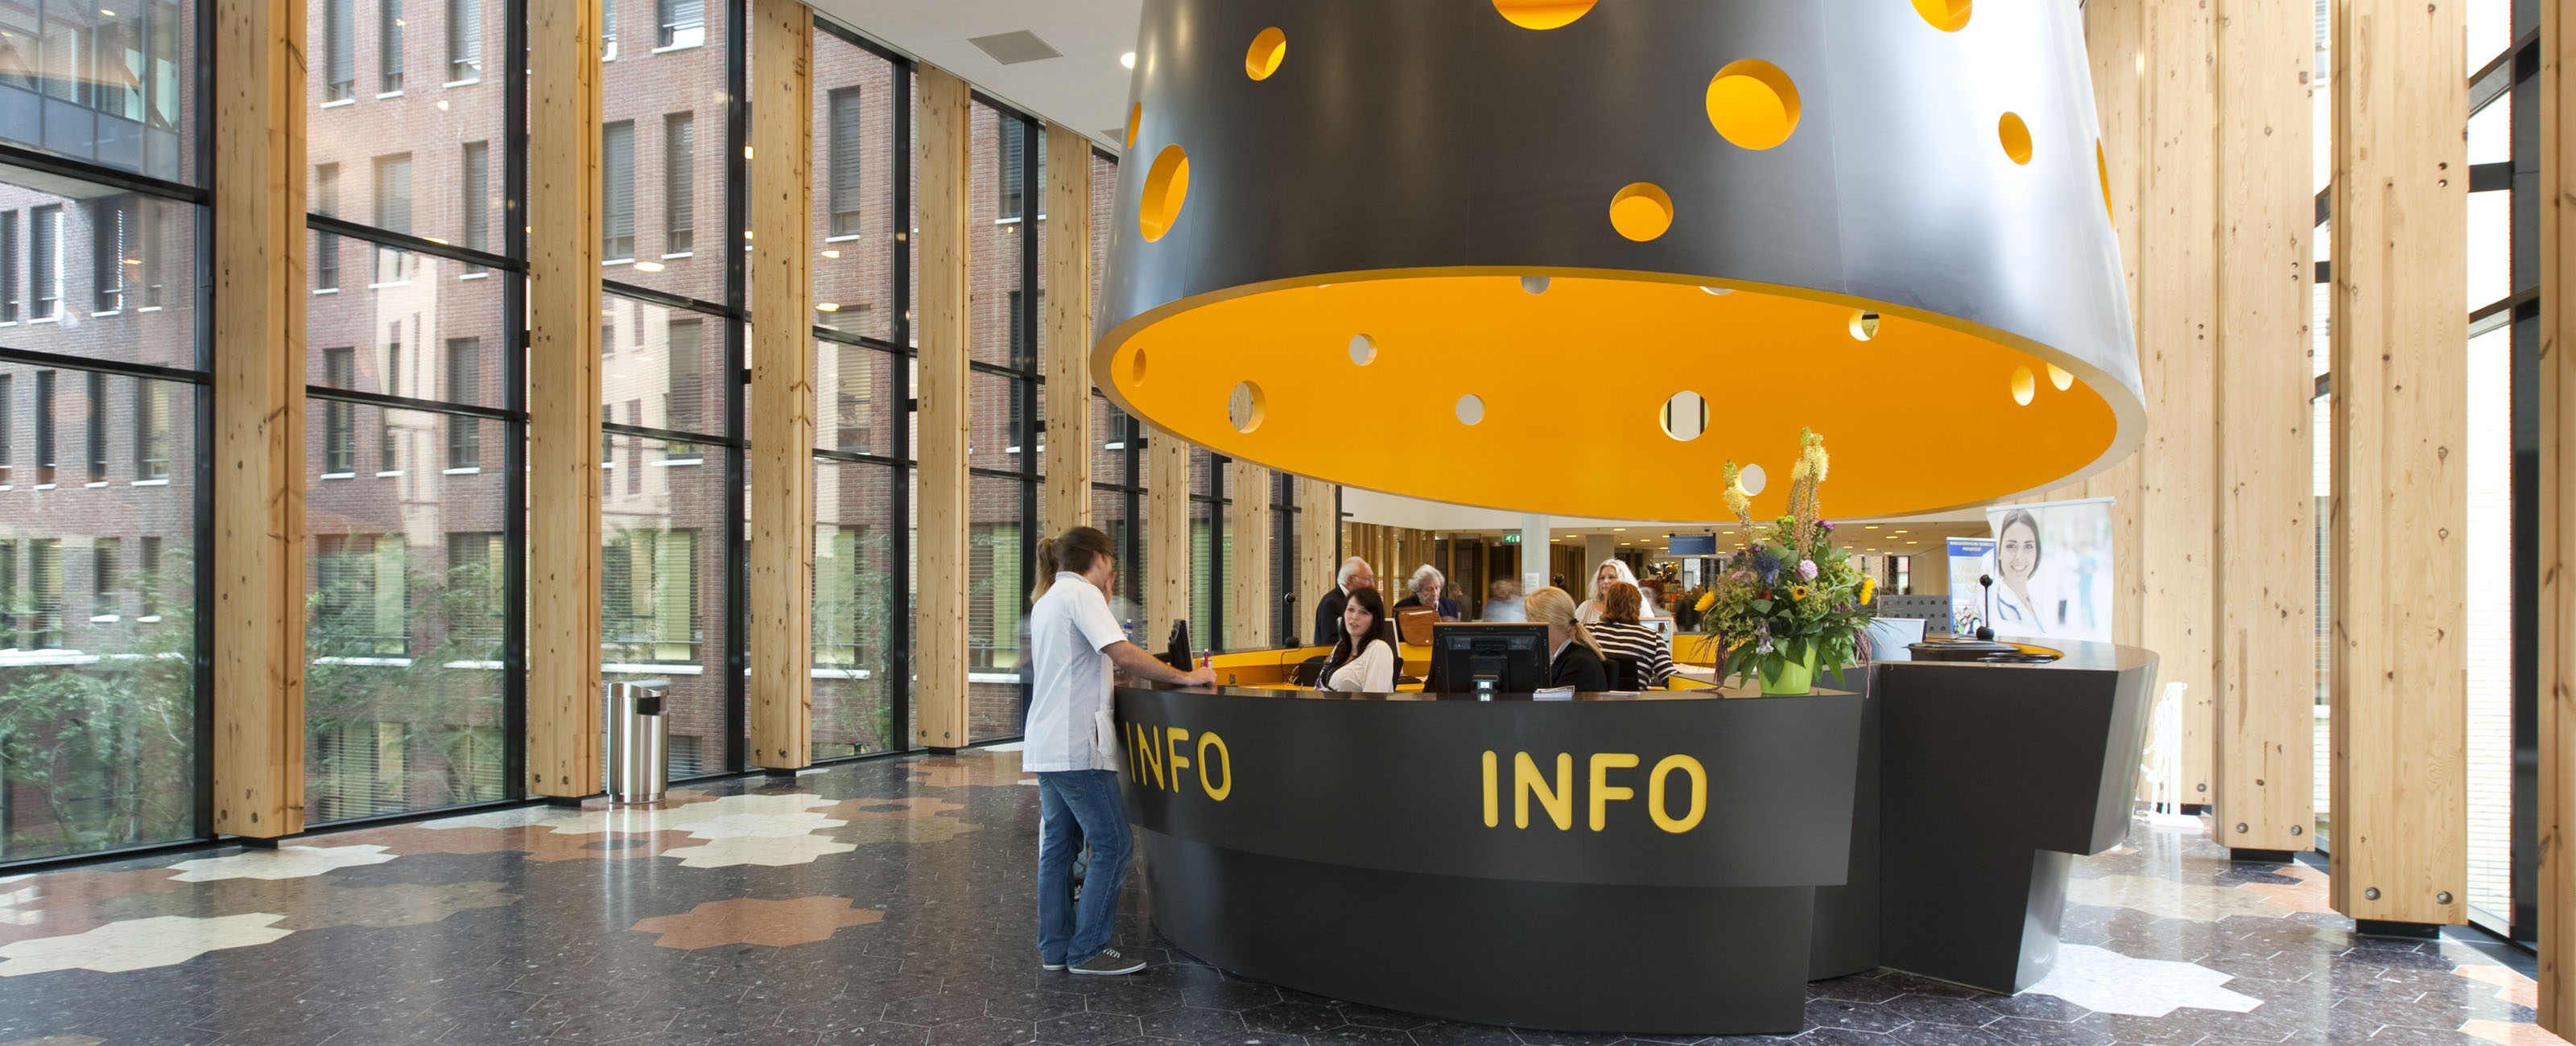 https://www.egm.nl/public/uploads/hero-interieur-Jeroen-Bosch-Ziekenhuis-%27s-Hertogenbosch-%27s-Hertogenbosch-58.jpg